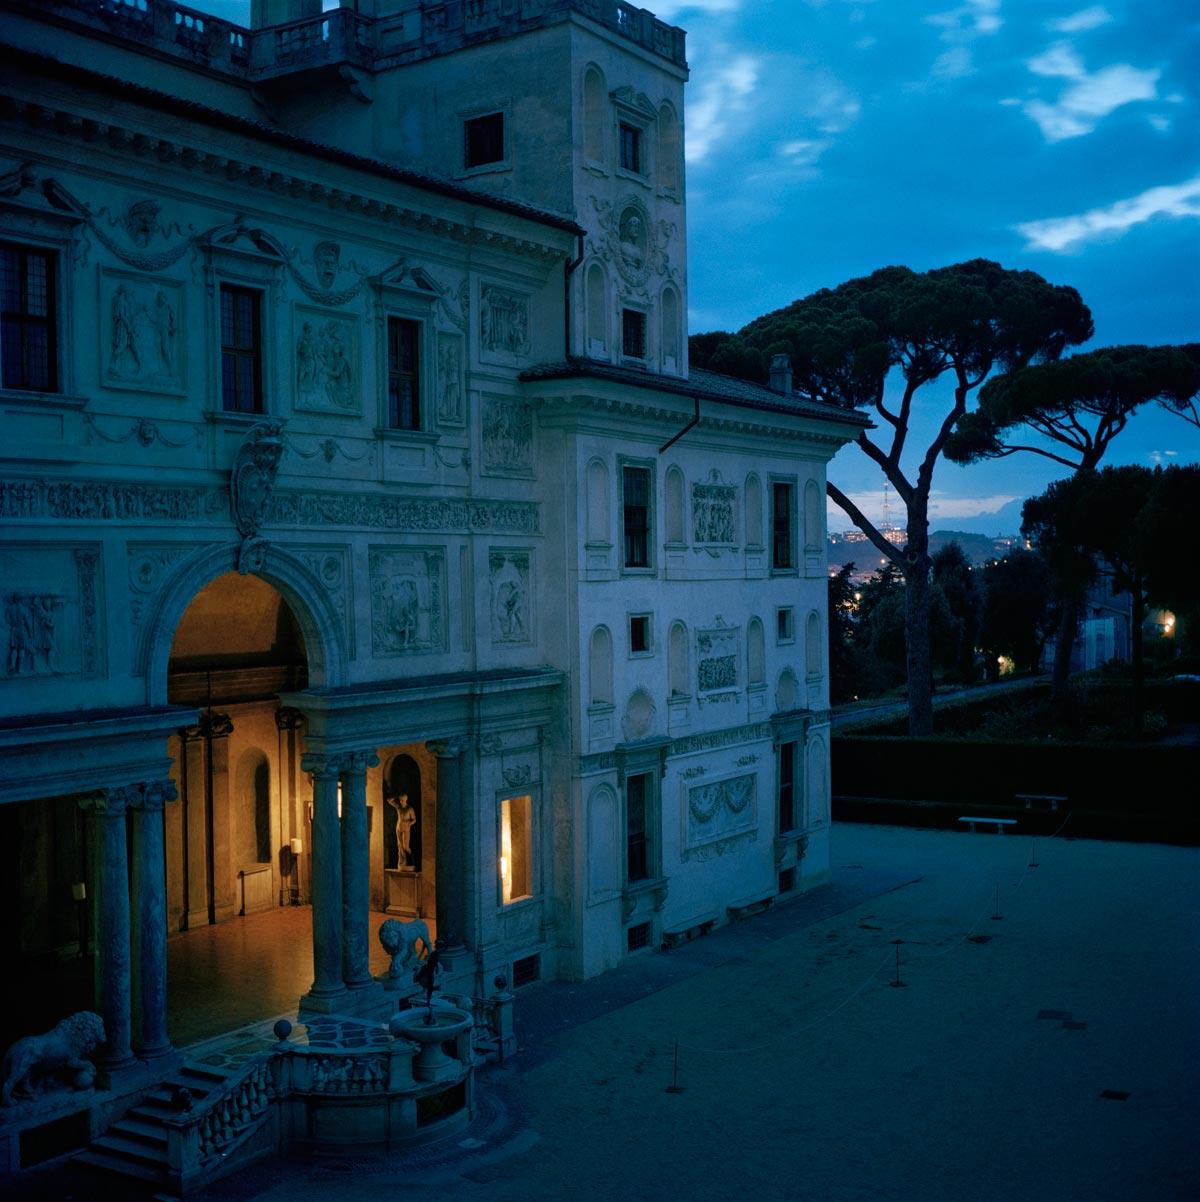 Grand-Tour-Cinecitta-Villa-Medicis-Rome-François-Halard-013